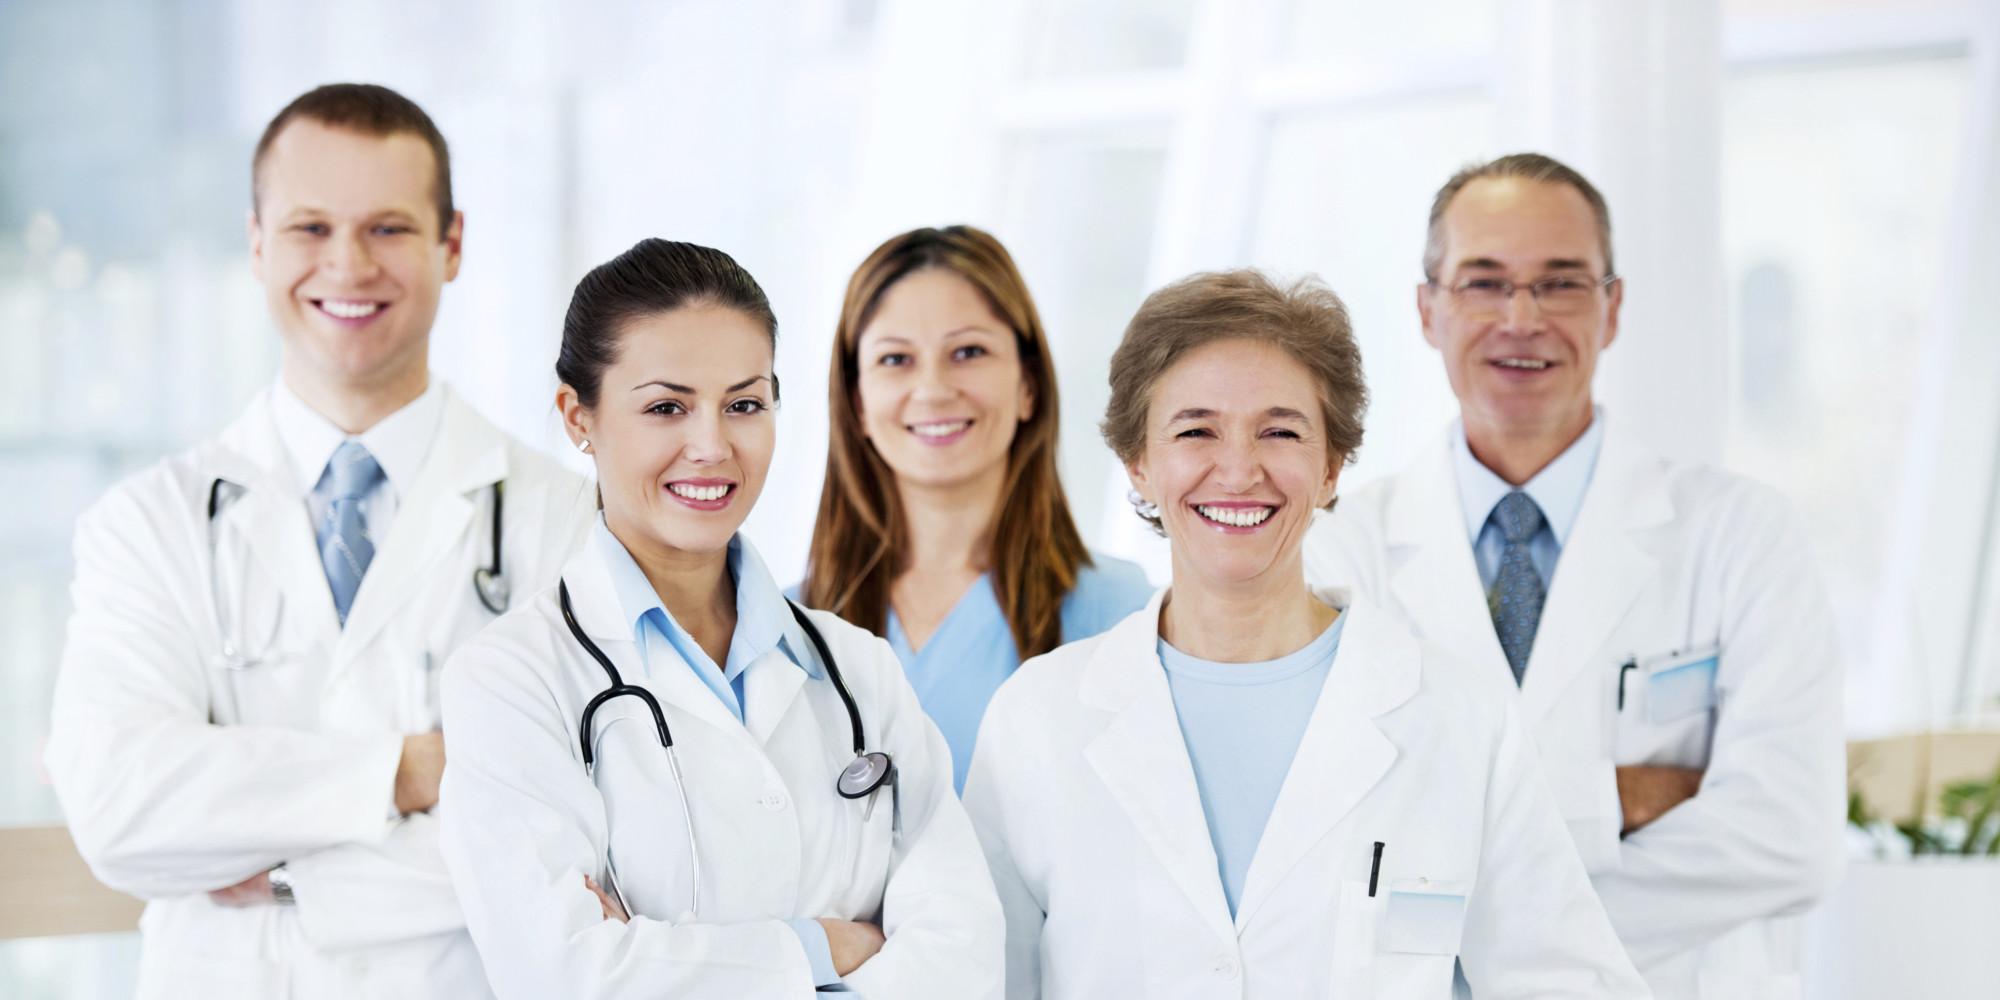 Medical companies